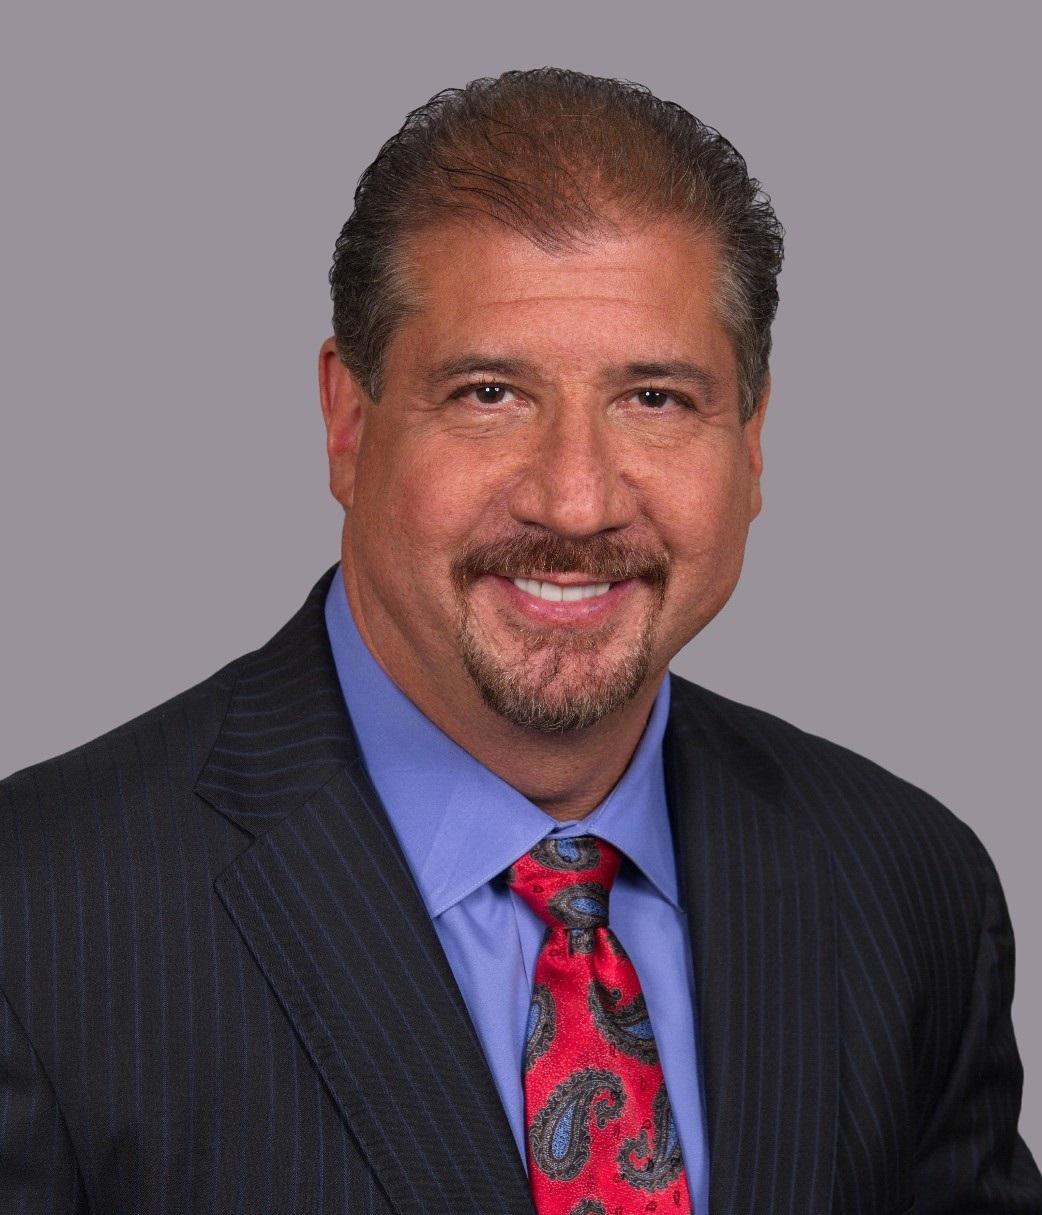 Mark Weinberger Named to MetLife's Board of Directors